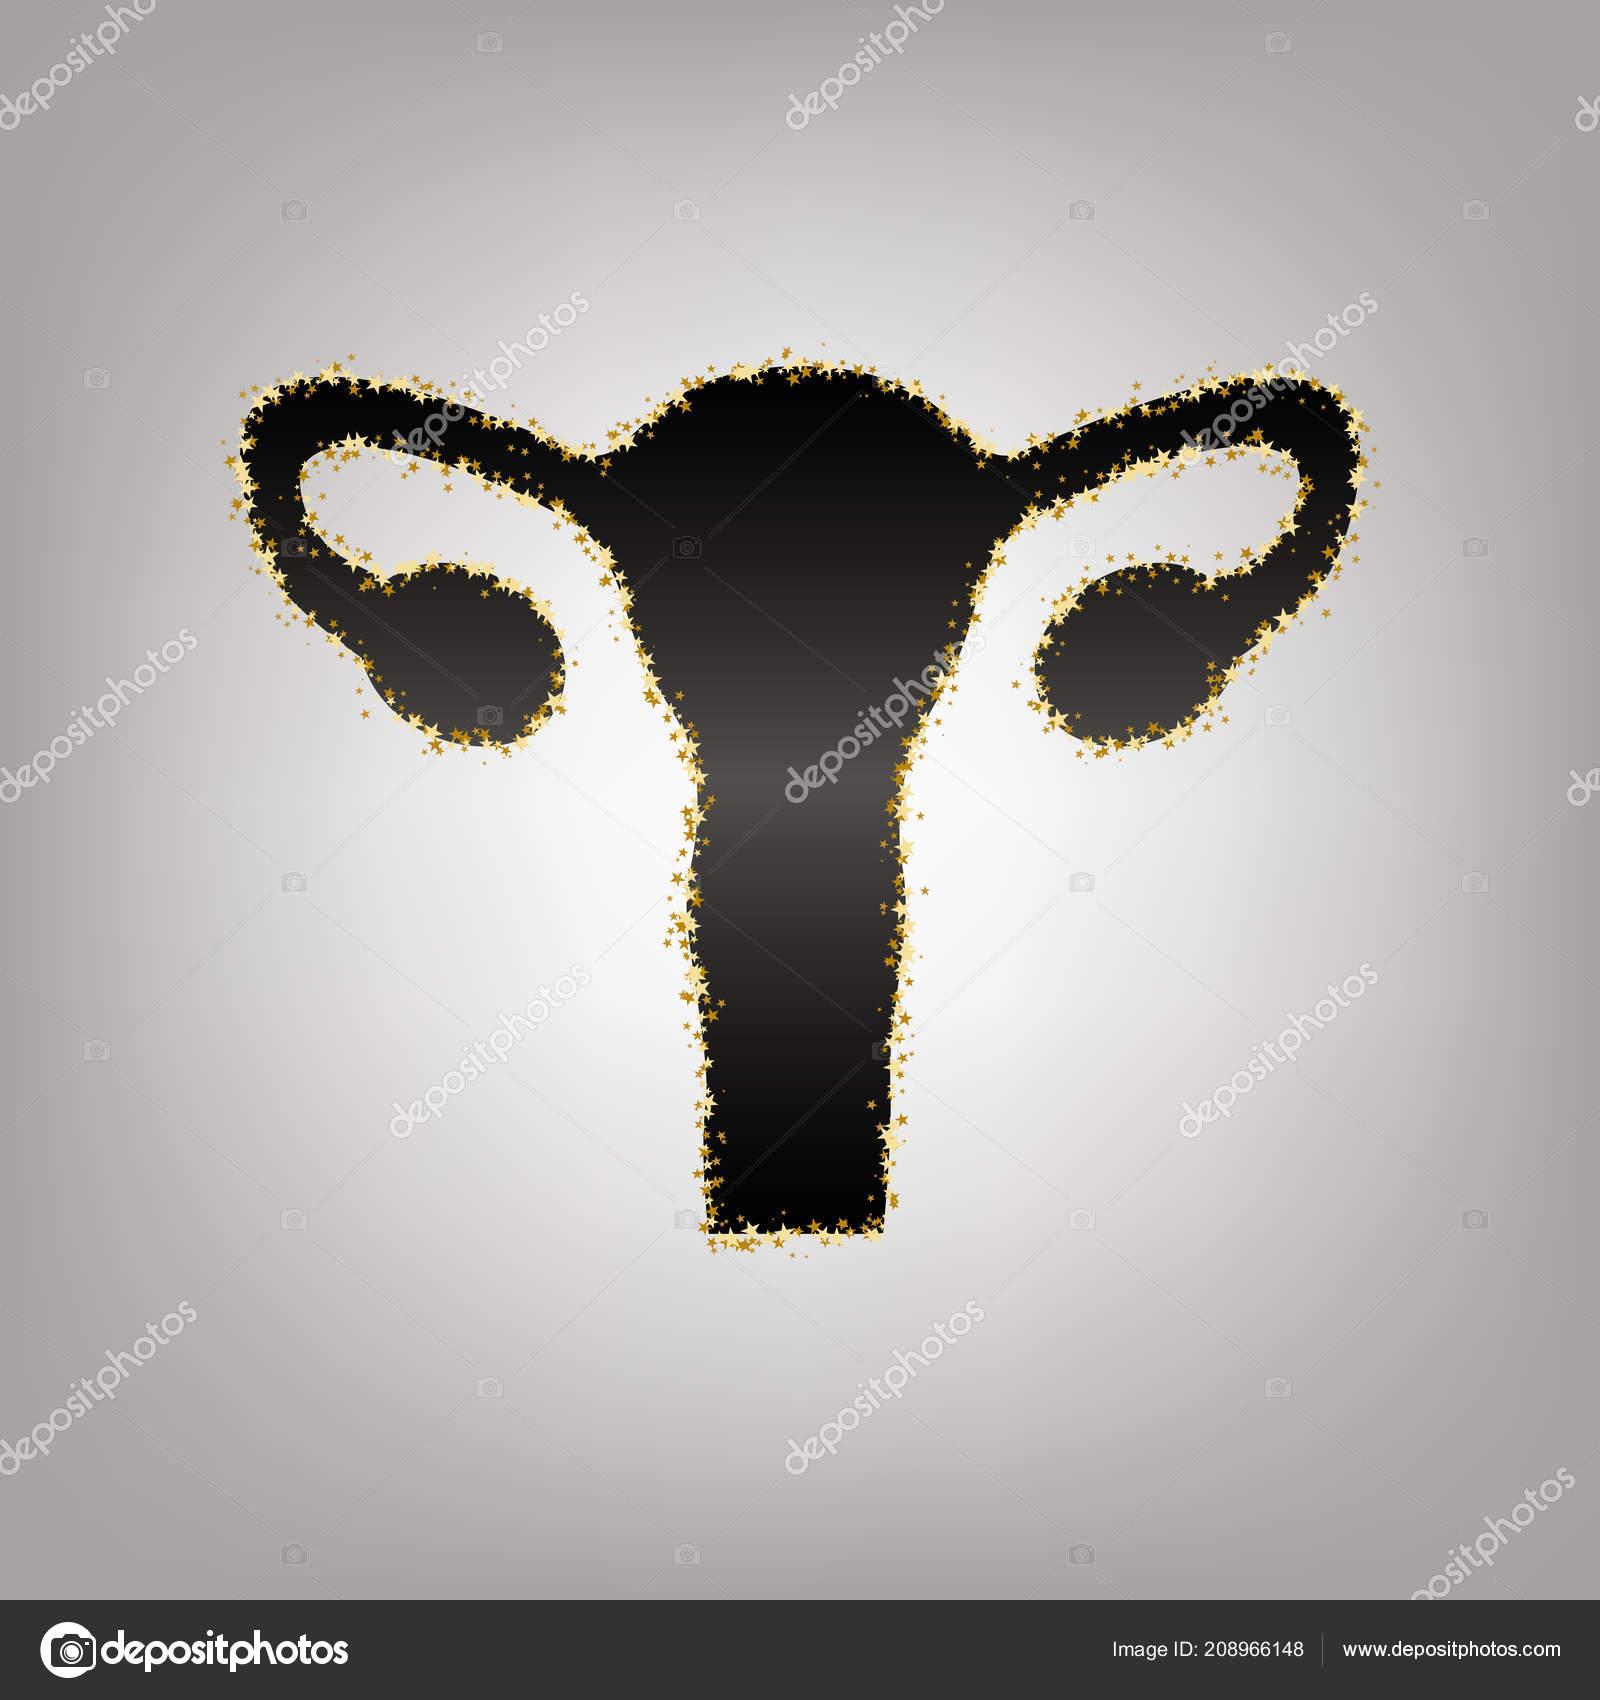 Human Anatomy Uterus Sign Vector Blackish Icon With Golden St